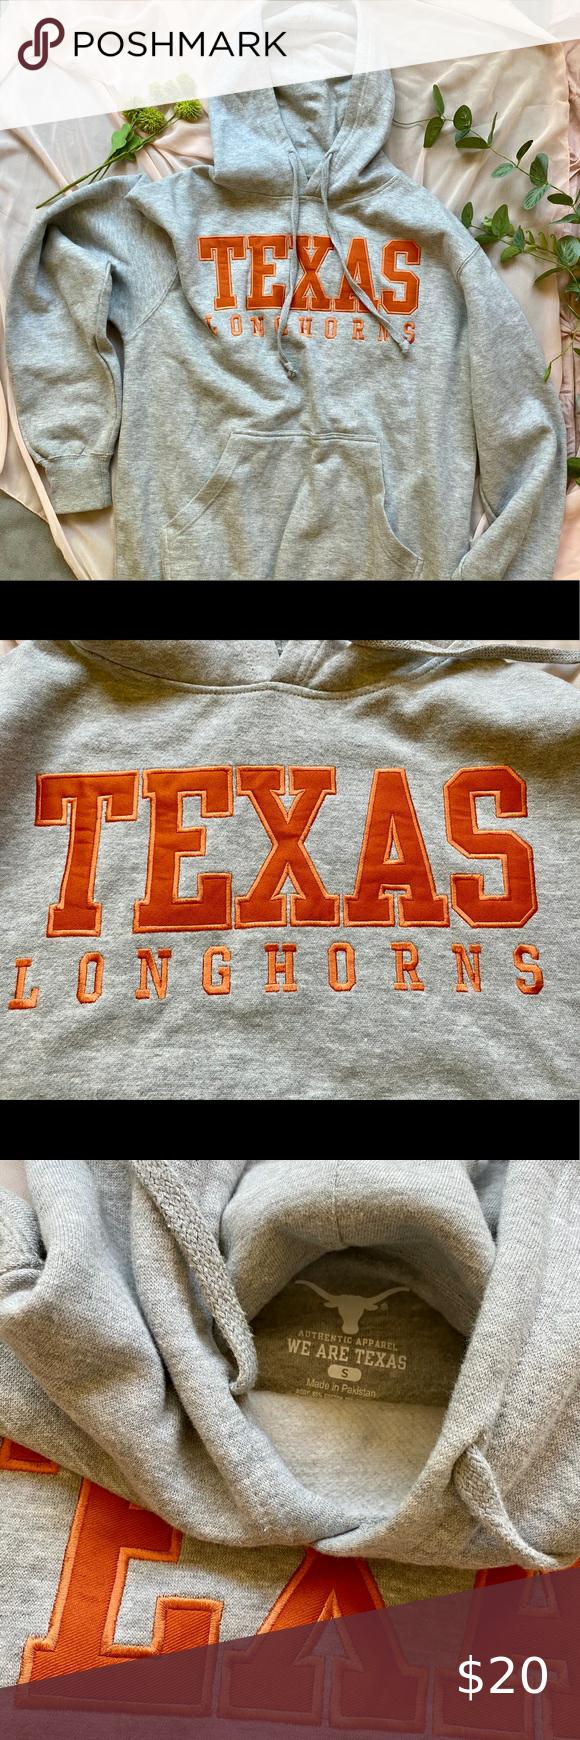 Texas Longhorn Sweater Sweaters Sweater Brands Texas Longhorns [ 1740 x 580 Pixel ]